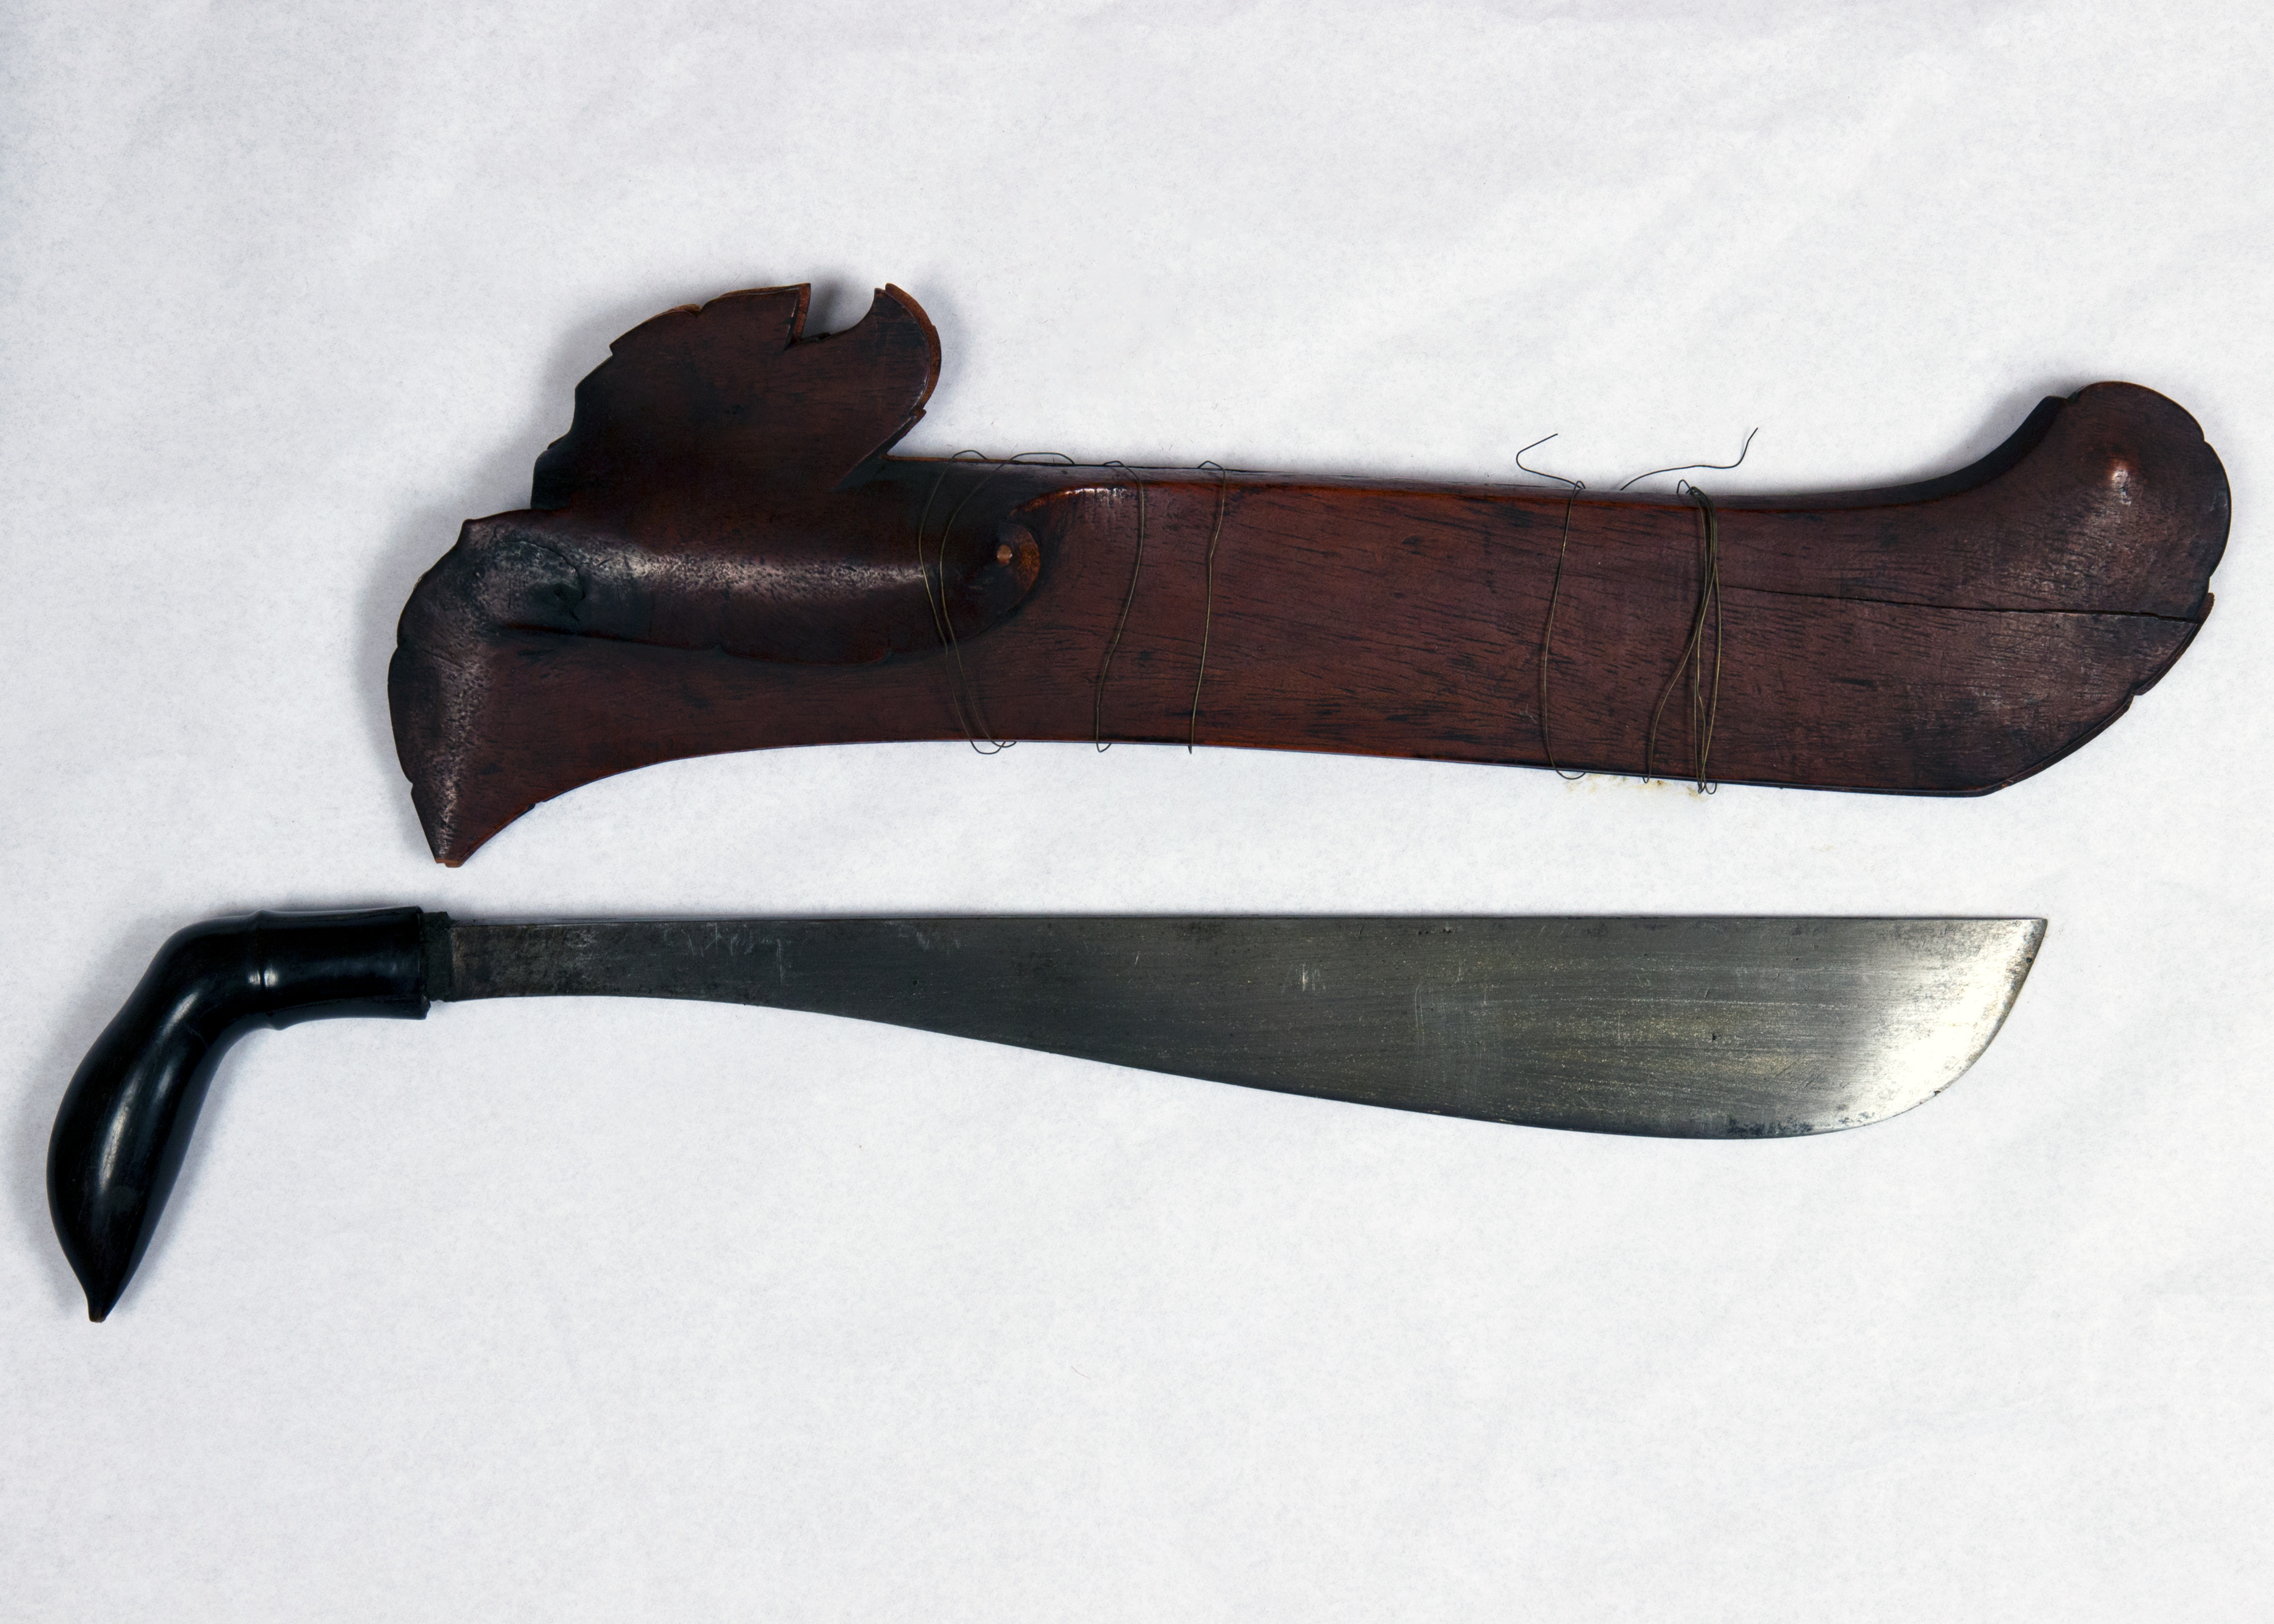 Knife_(Parang)_with_Sheath_MET_36.25.840a_b_001_Apr2017.jpg